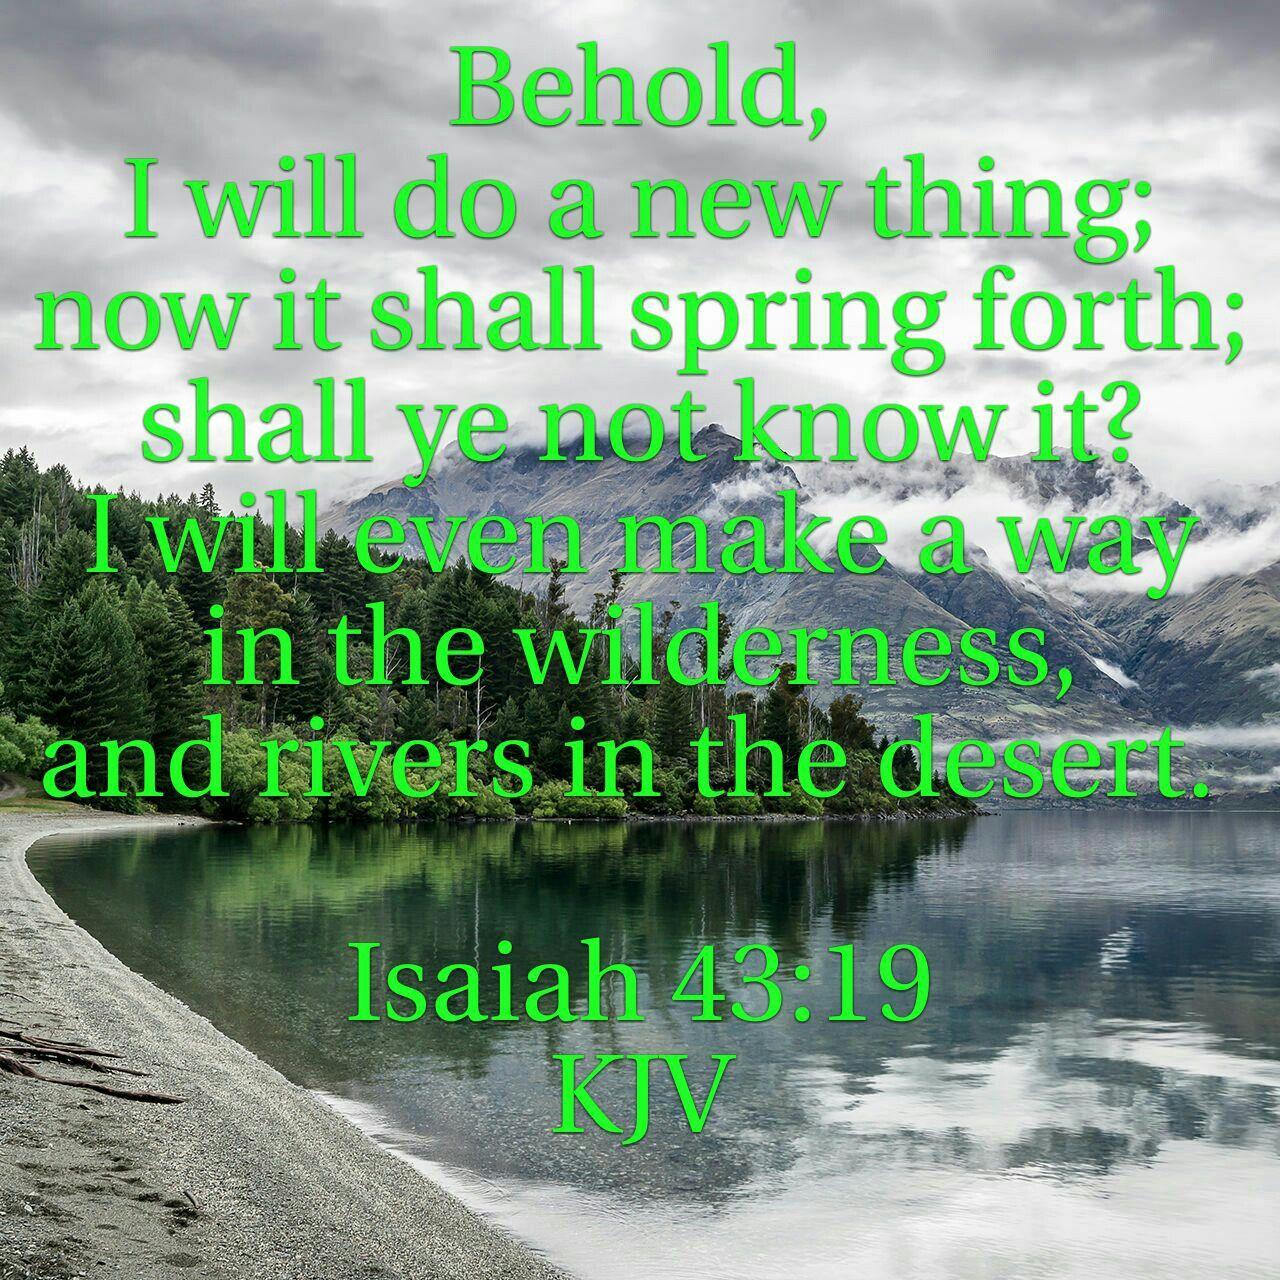 Isaiah 43:19 KJV   Rivers in the desert, Isaiah 43 19, Isaiah